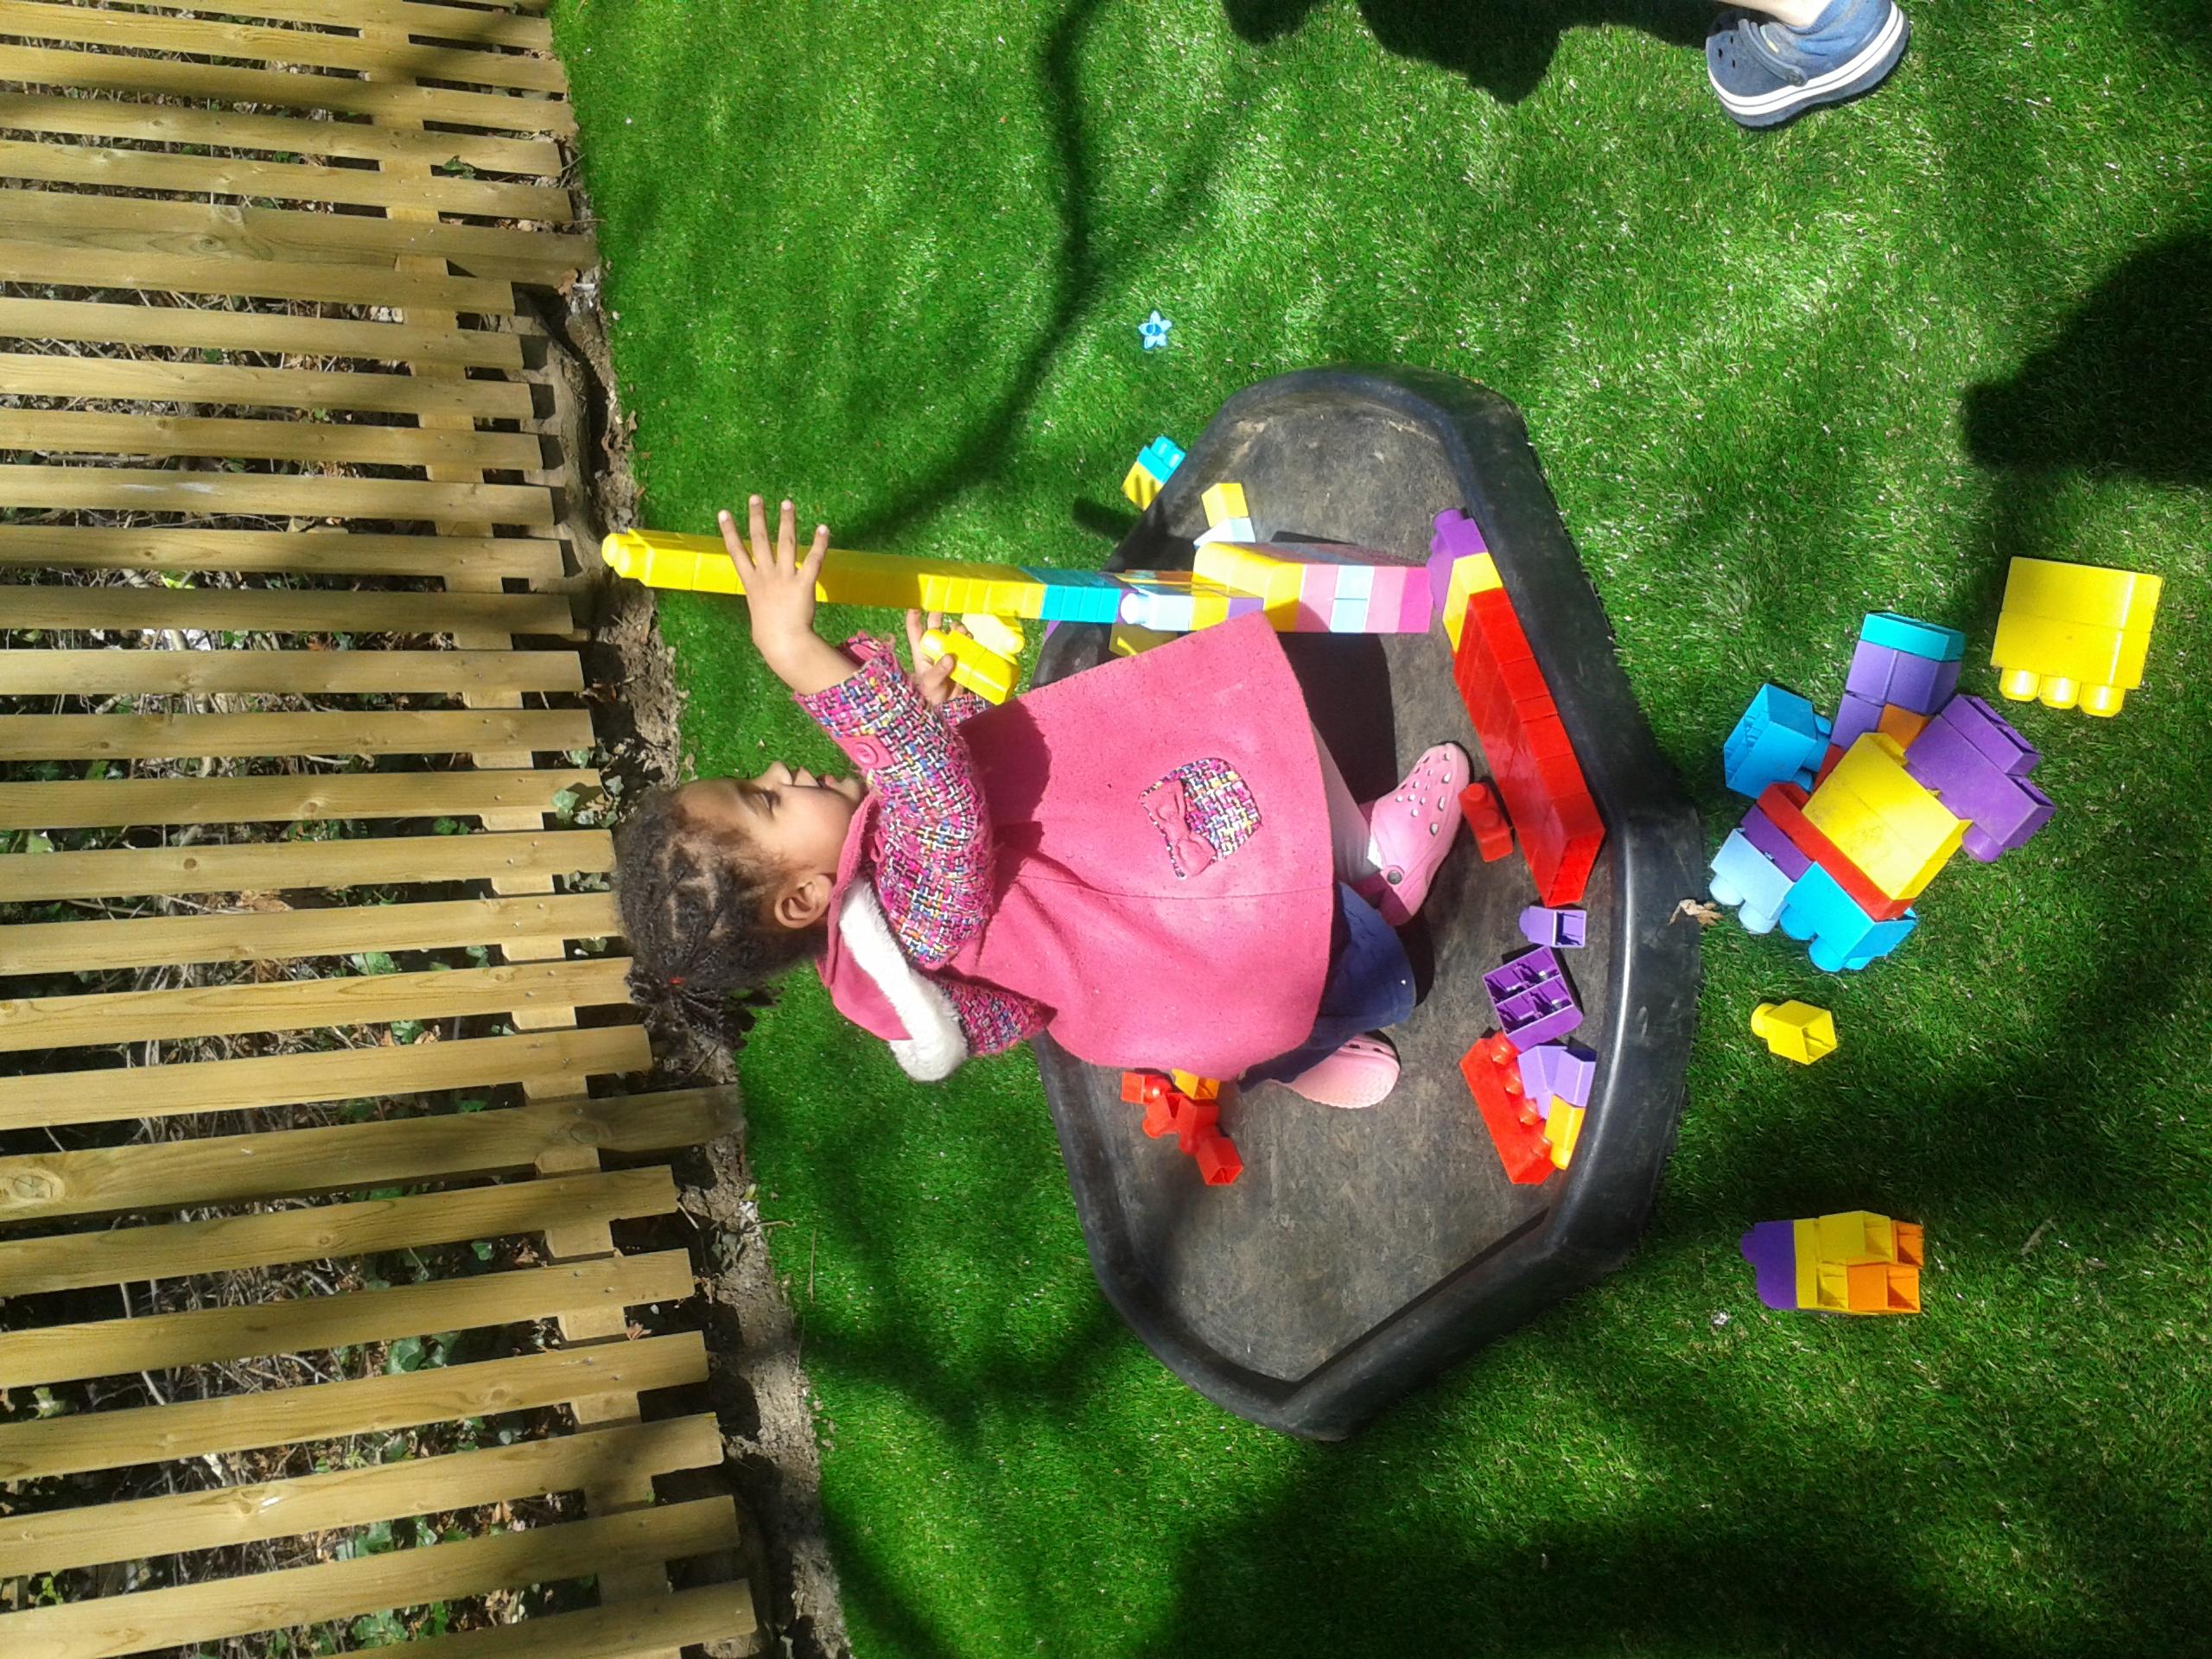 Balancing skills!